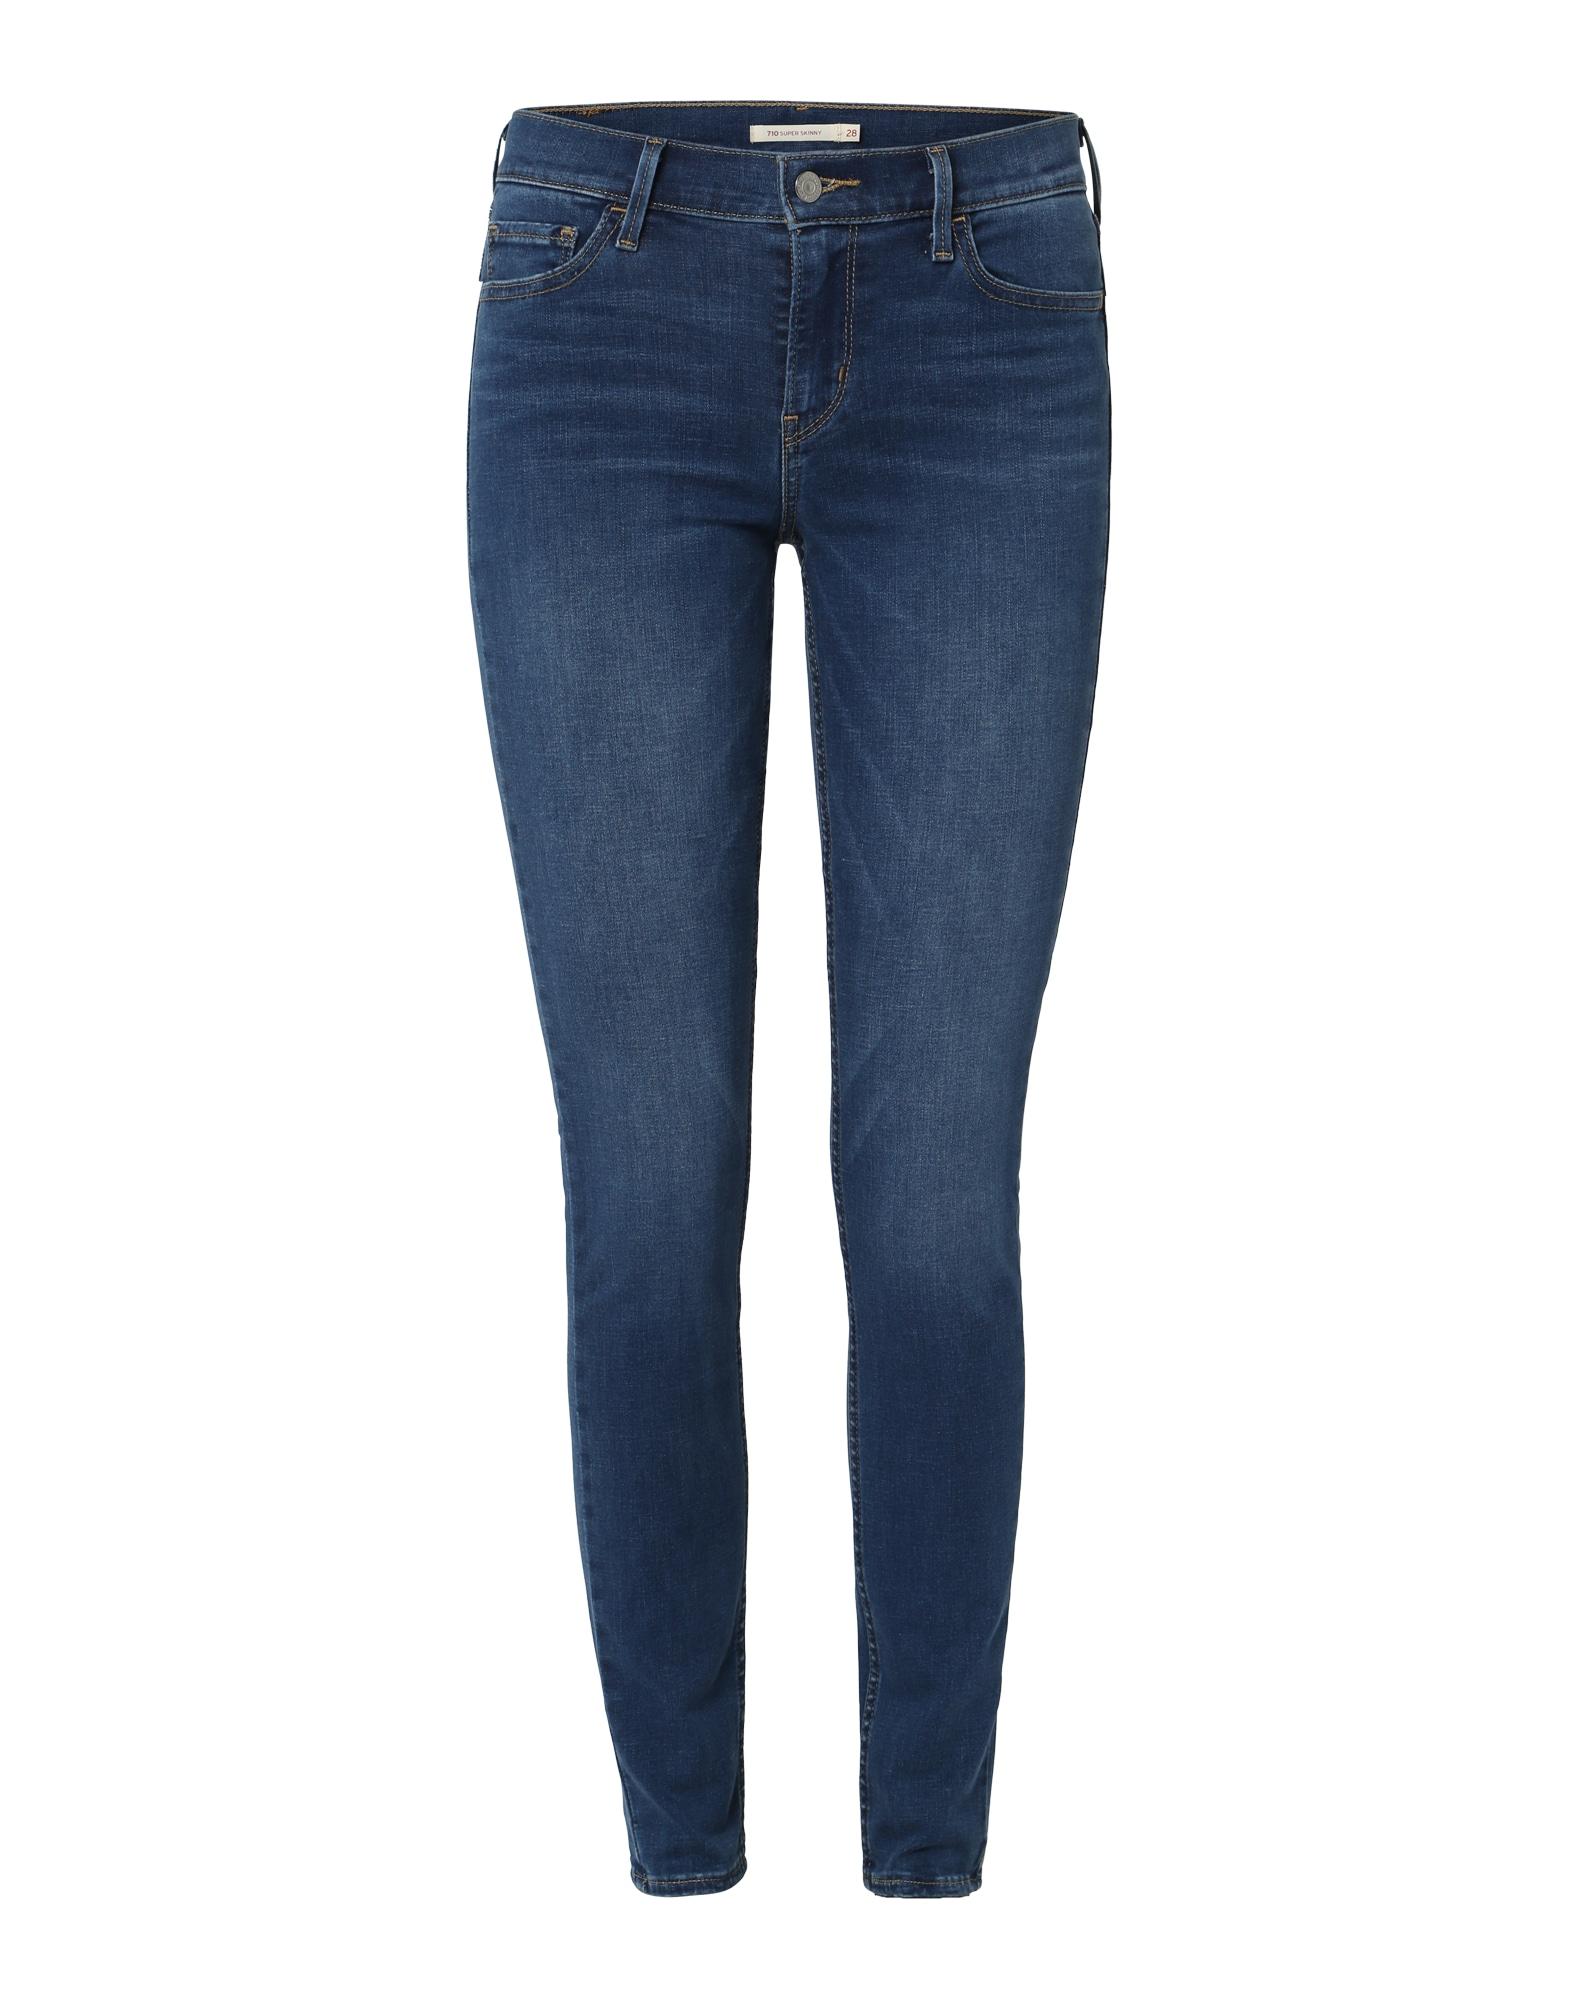 LEVI'S Dames Jeans 710 Innovation Super Skinny blauw